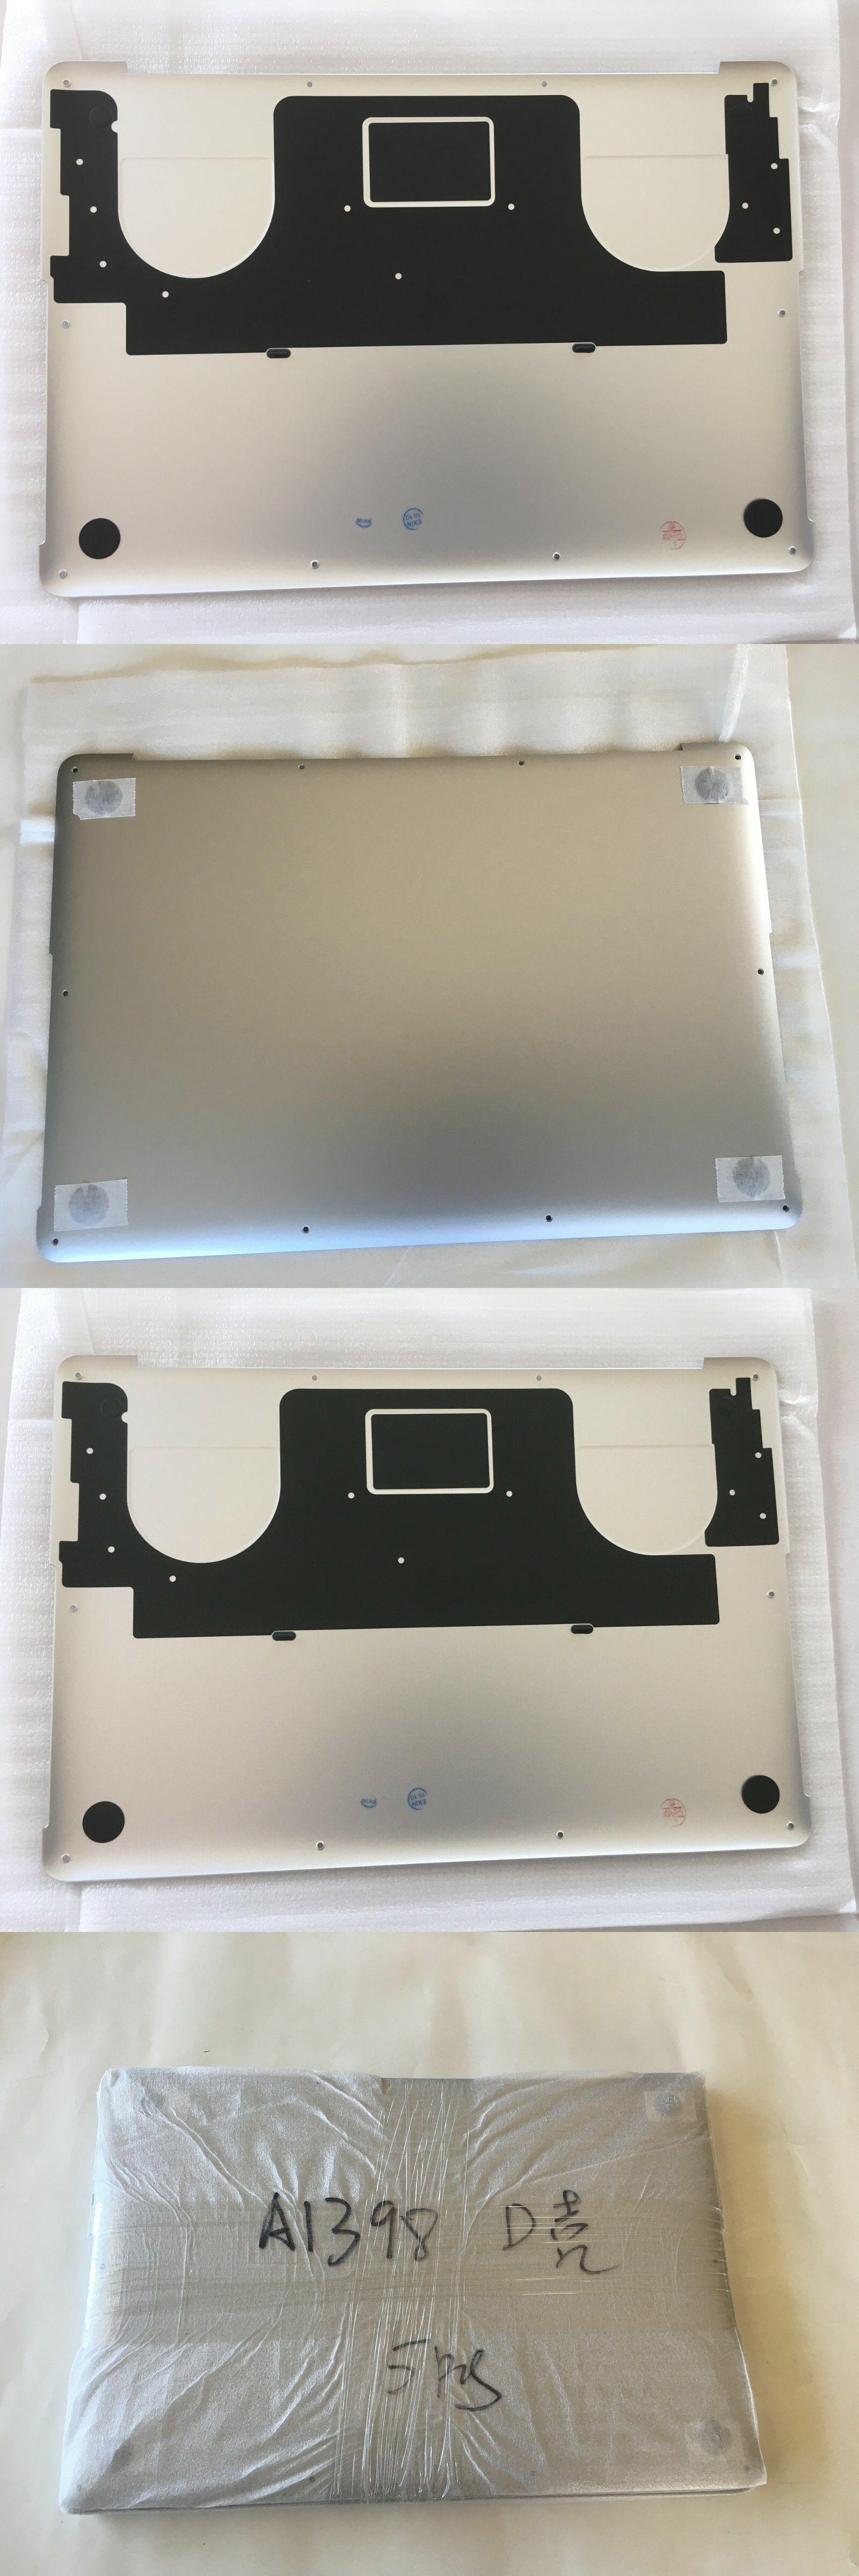 the latest e5b2f ec7f2 Laptop Replacement Parts 182089: New Macbook Pro 15 Retina A1398 ...